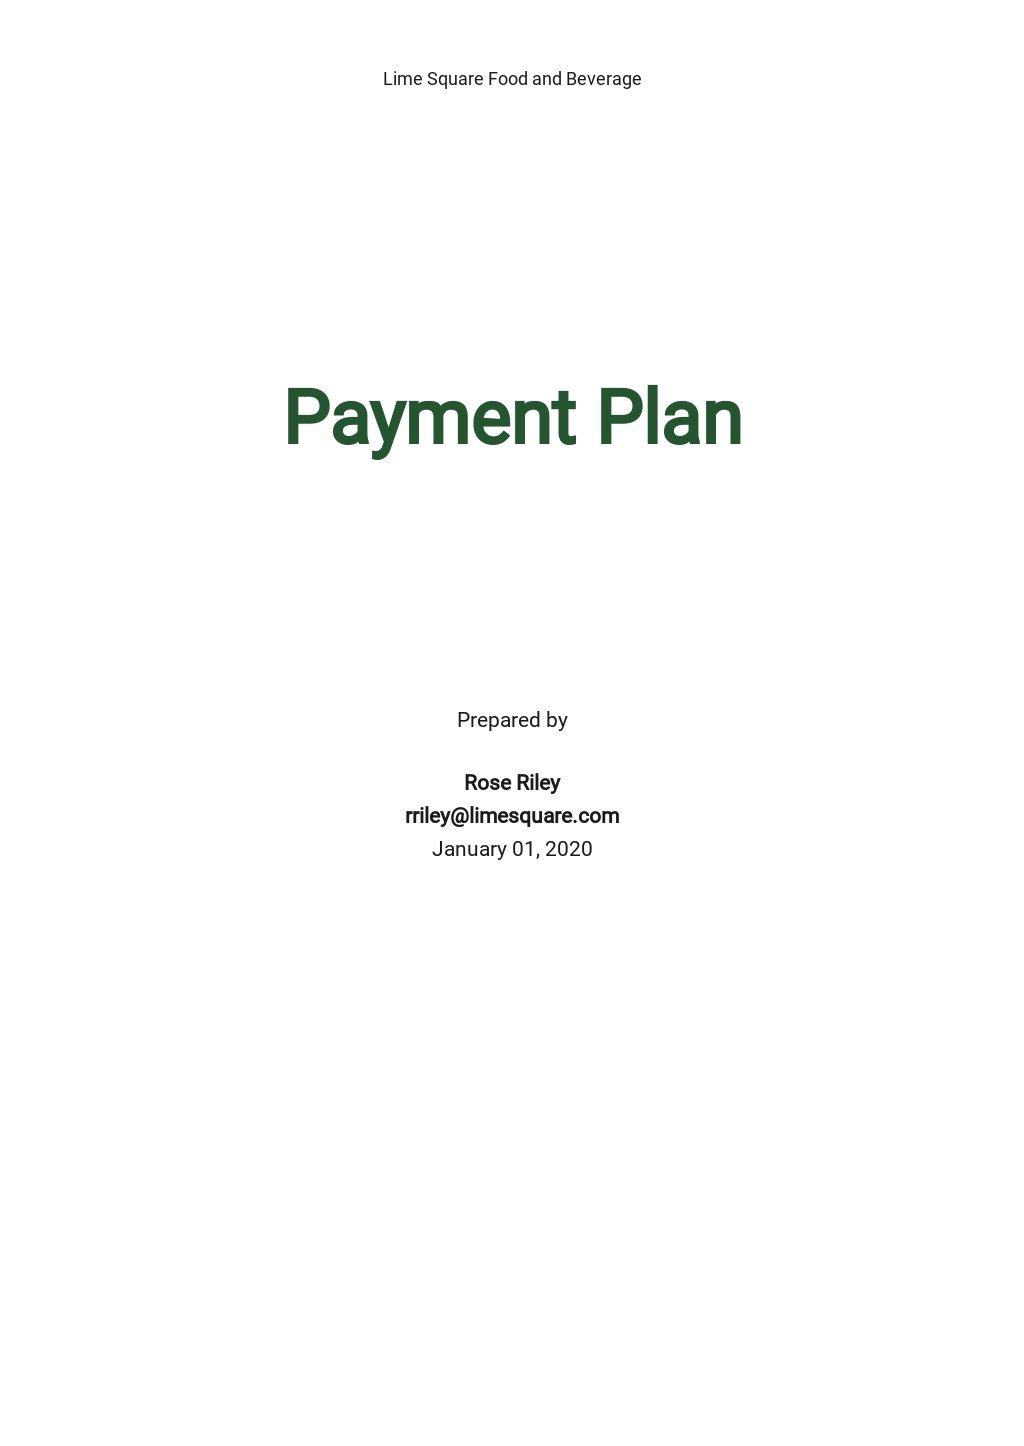 Payment Plan Template.jpe